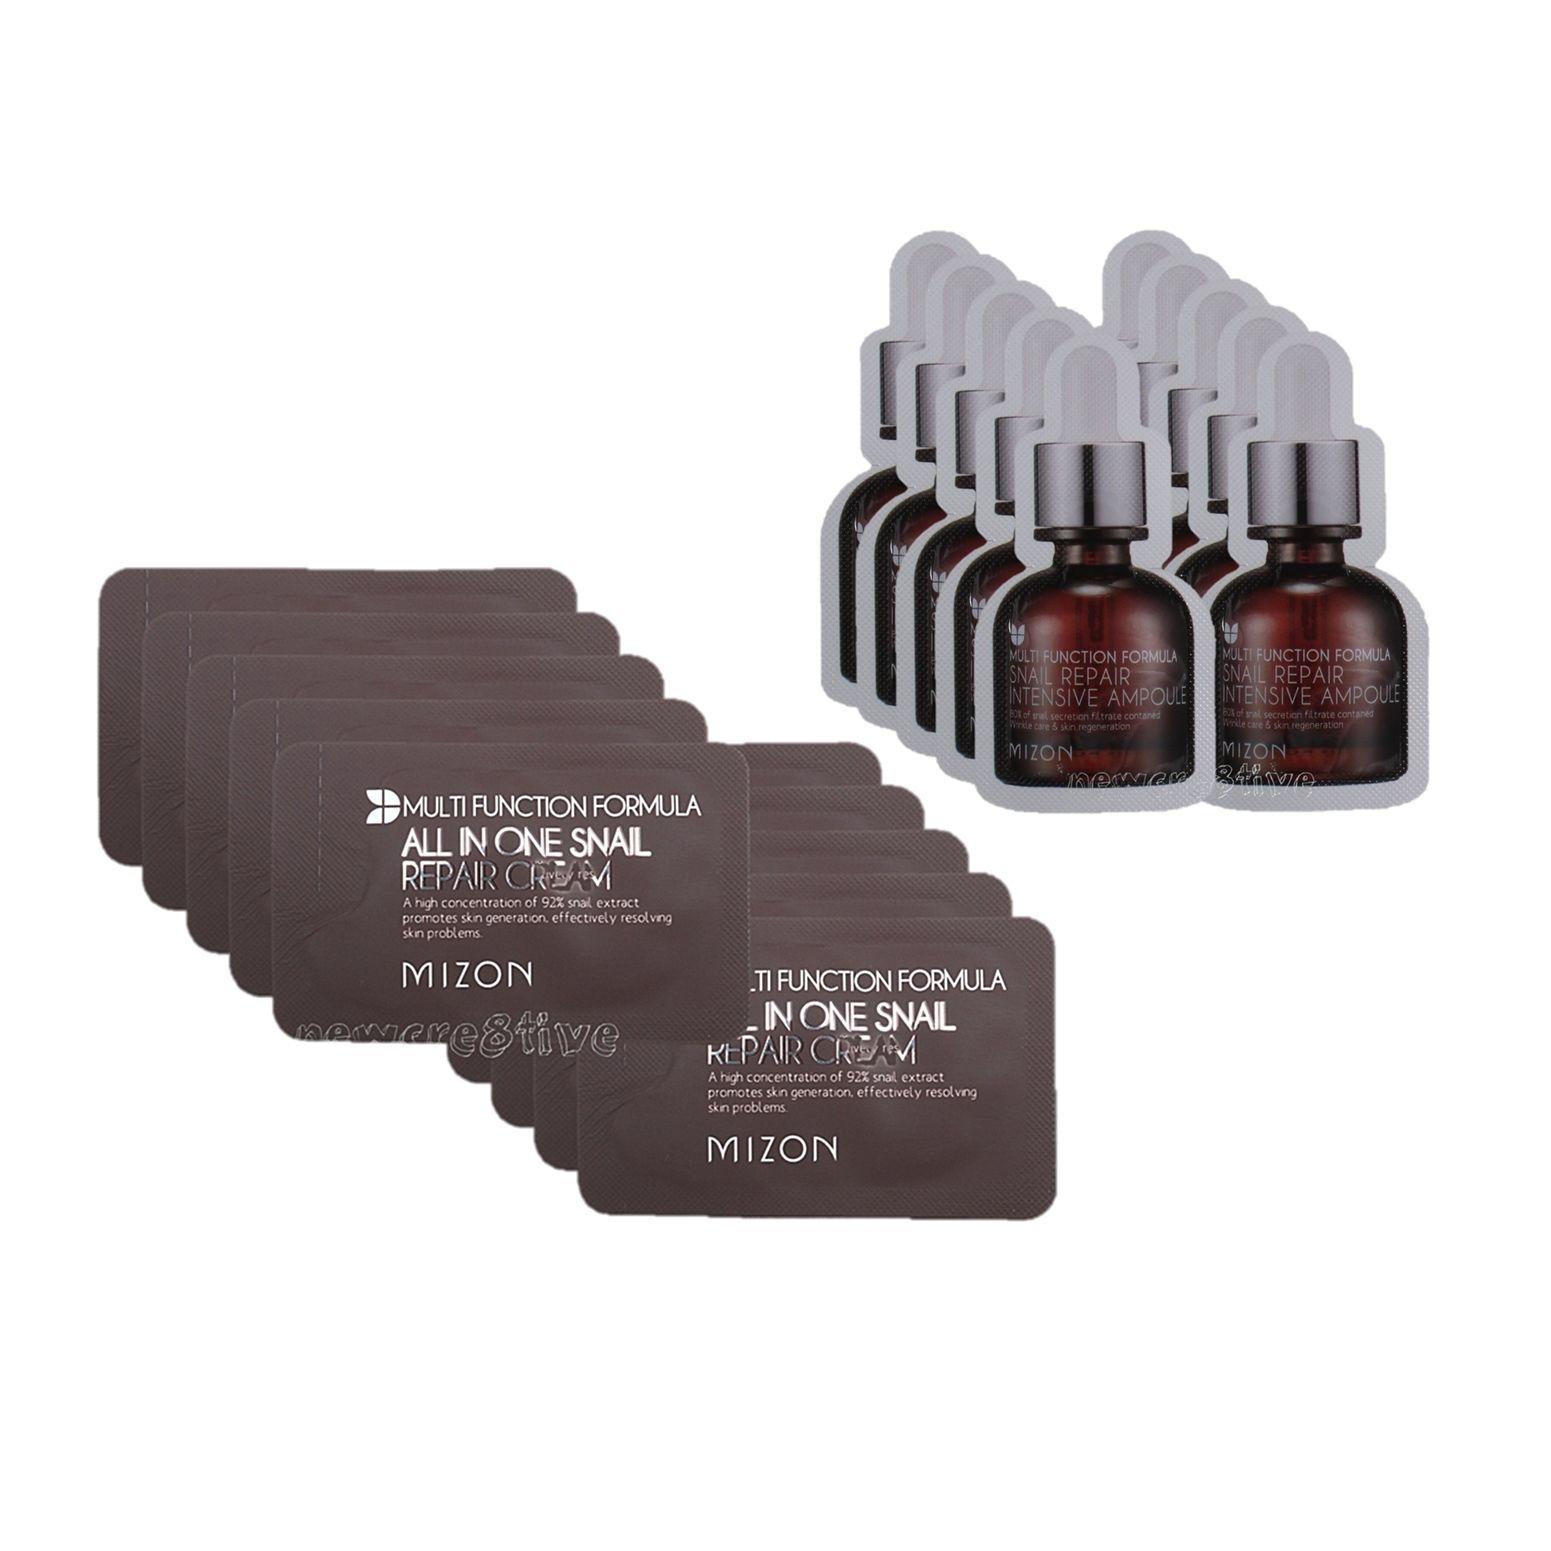 Mizon Snail Repair Cream Sample 10pcs Intensive Ampoule 30ml Transaction History